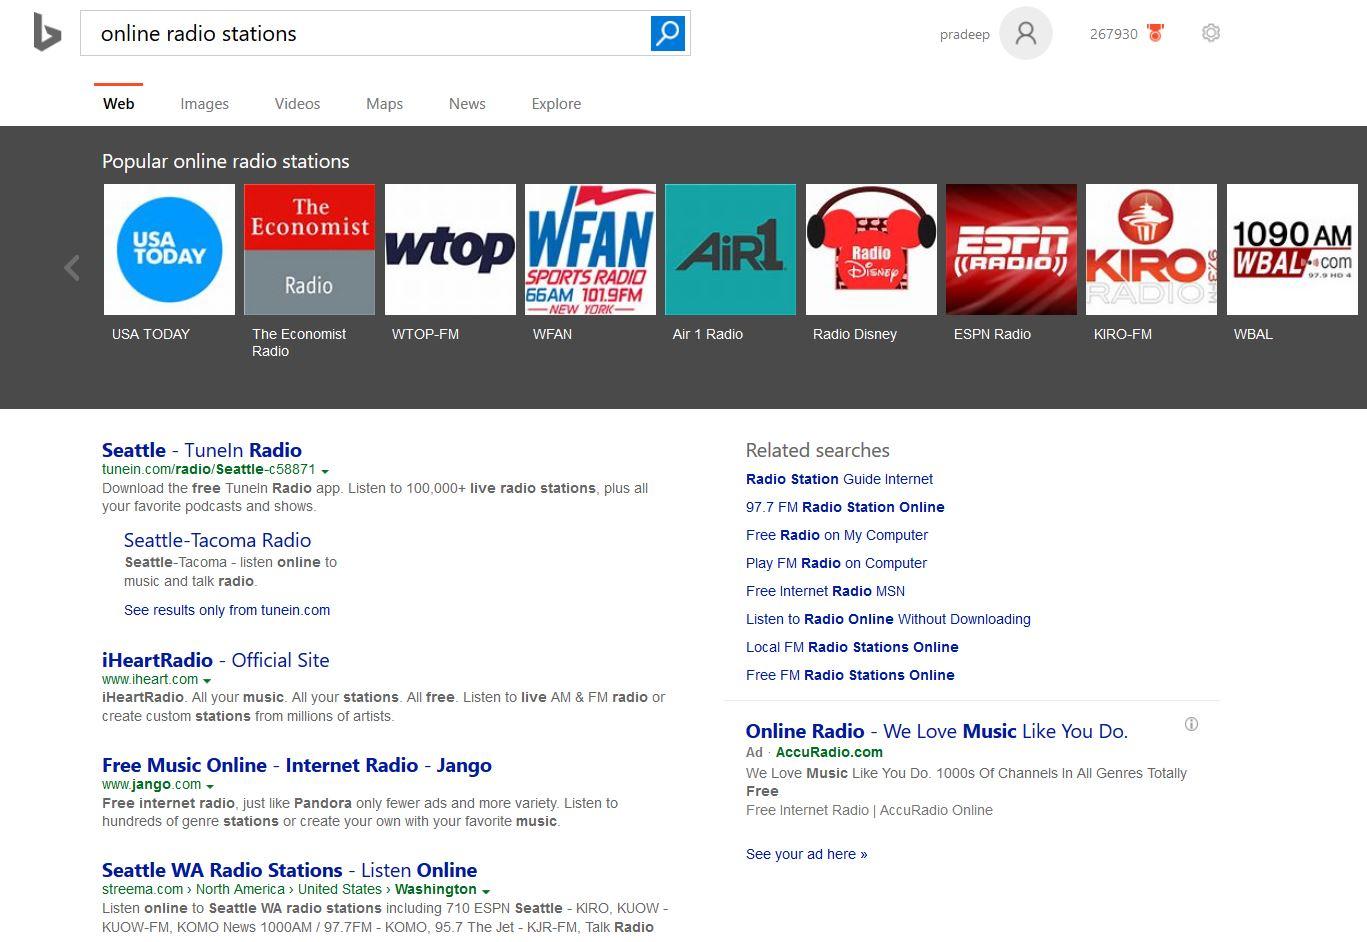 bing-online-radio-stations